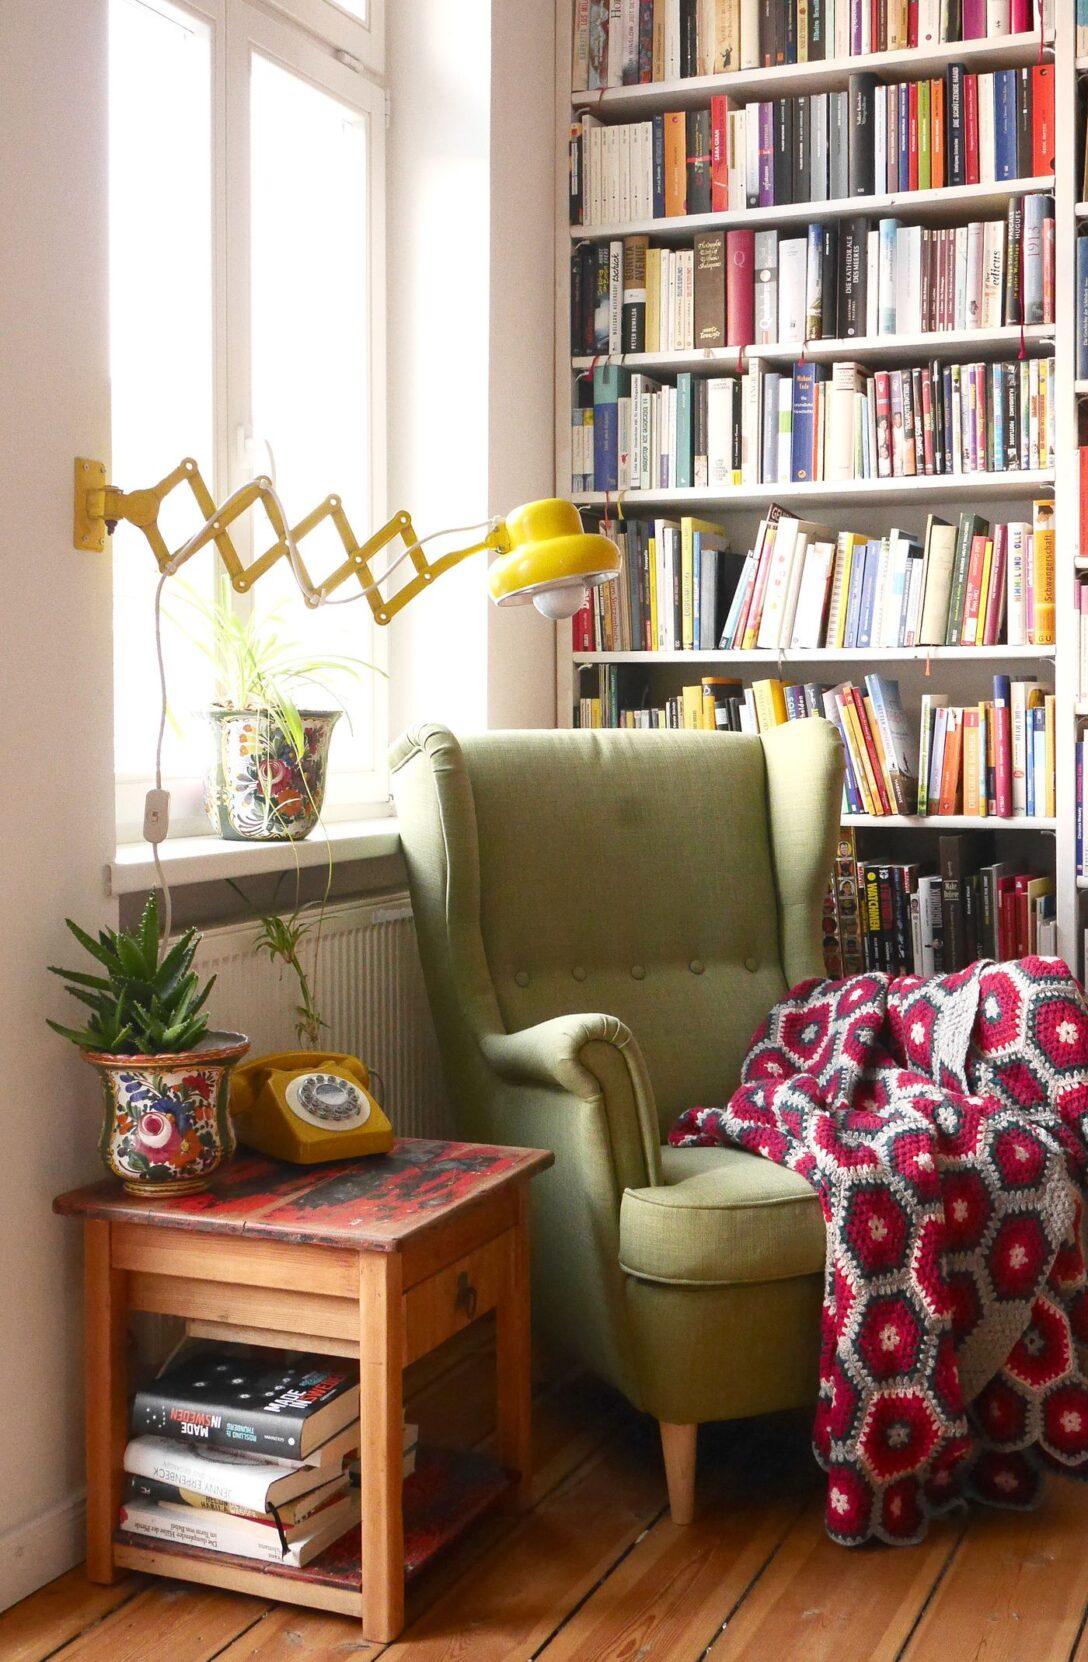 Large Size of Ikea Relaxsessel Elektrisch Strandmon Muren Leder Sessel Gebraucht Schnsten Ideen Fr Deinen Modulküche Küche Kosten Garten Sofa Mit Schlaffunktion Betten Wohnzimmer Ikea Relaxsessel